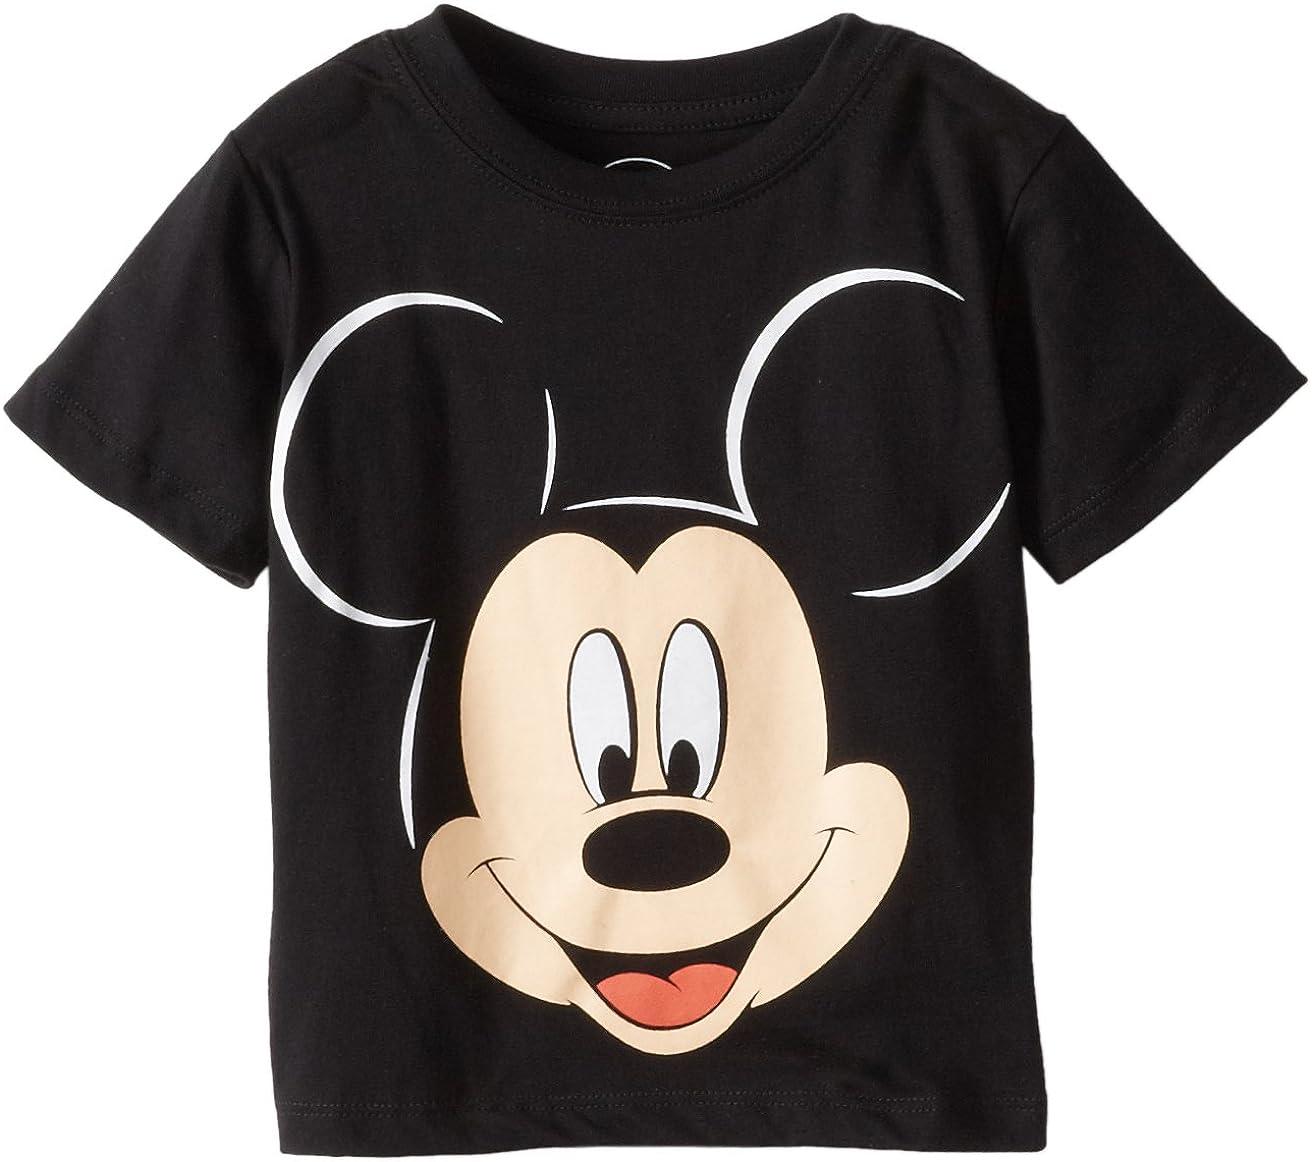 Disney Mickey Mouse Boys' Face T-Shirt